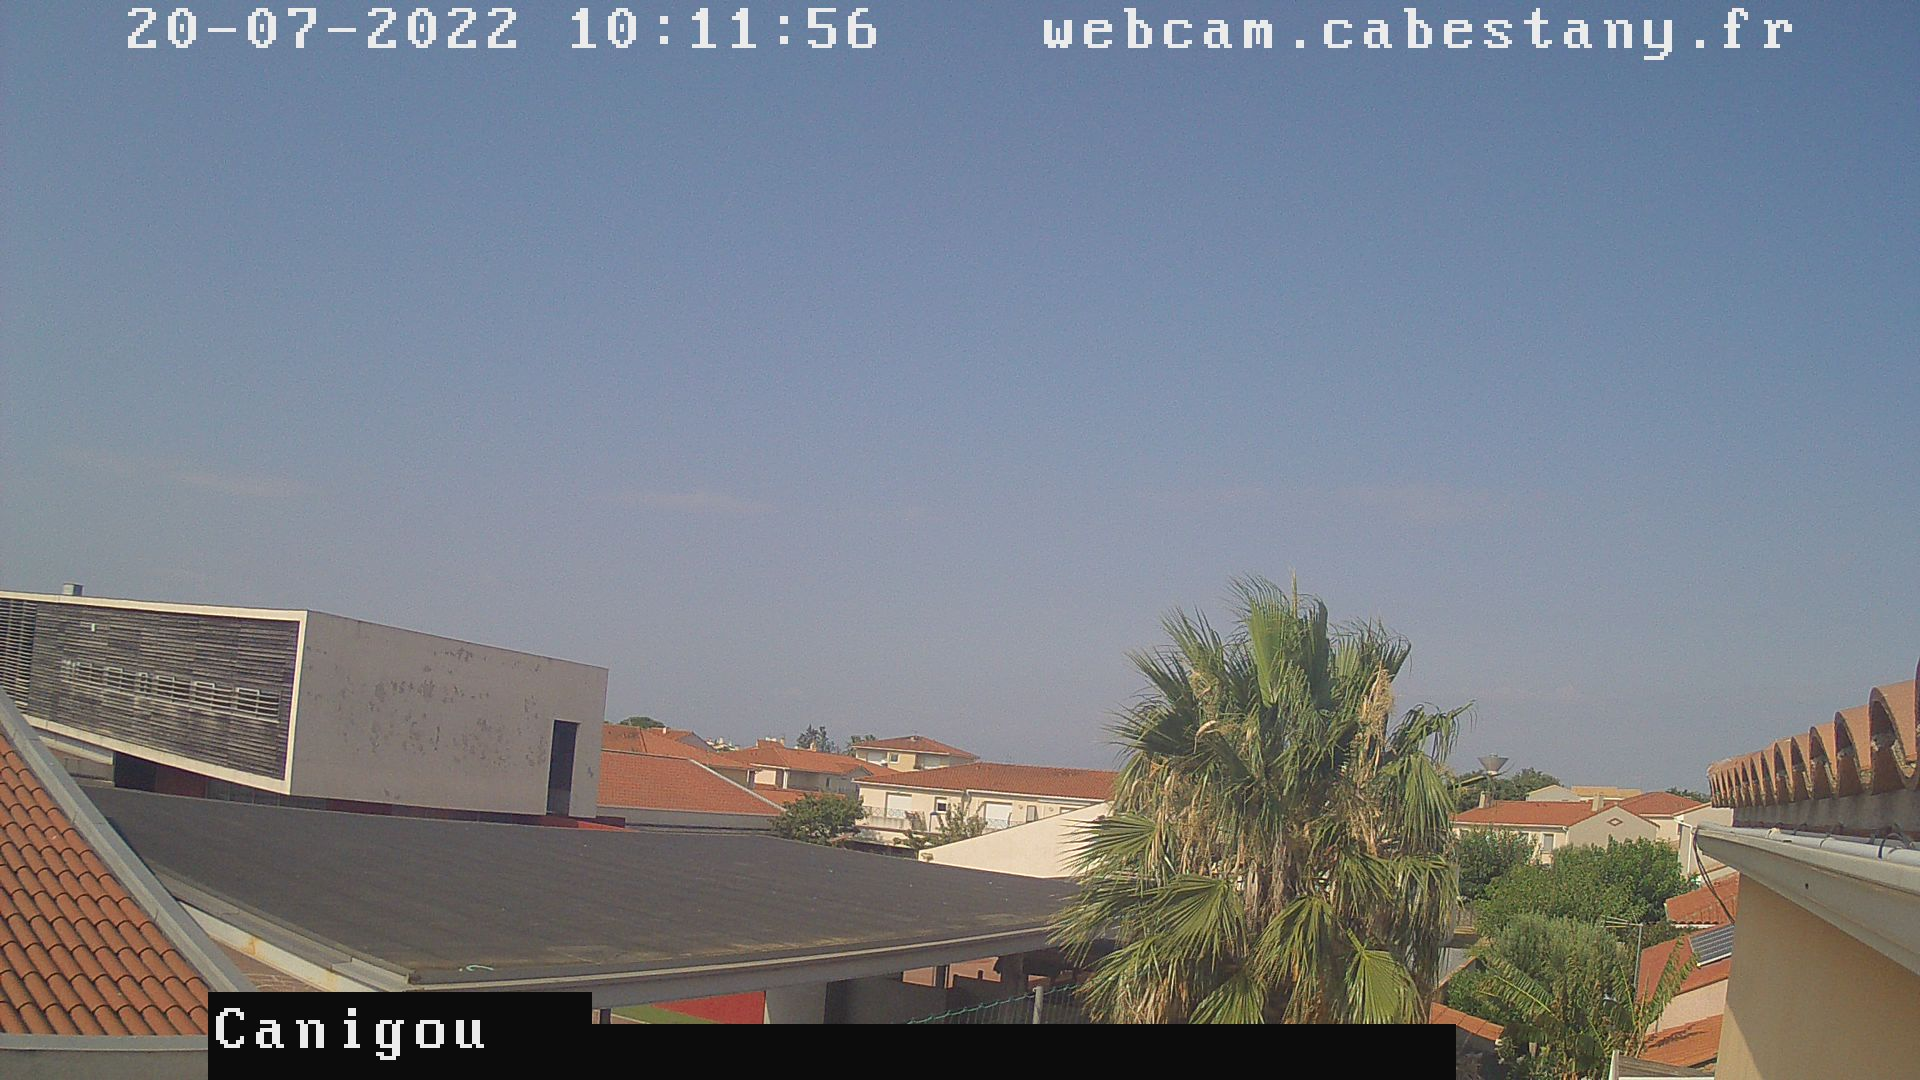 Webcam météo cabestany (66330 – pyrénées orientales)